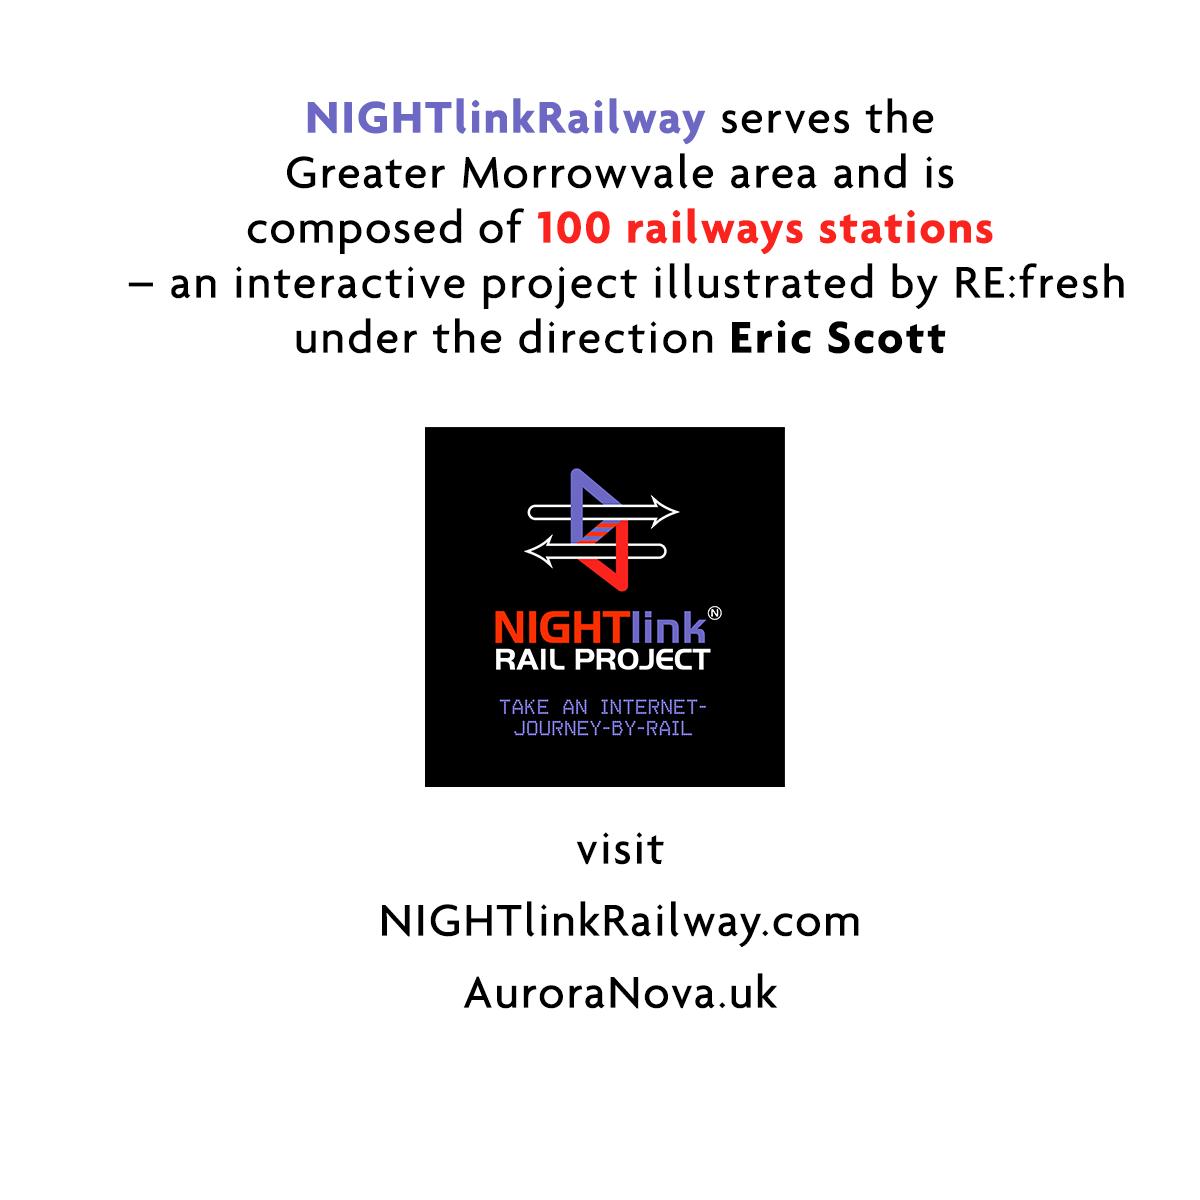 NIGHTlinkRailway-NLRW-Info-Panel